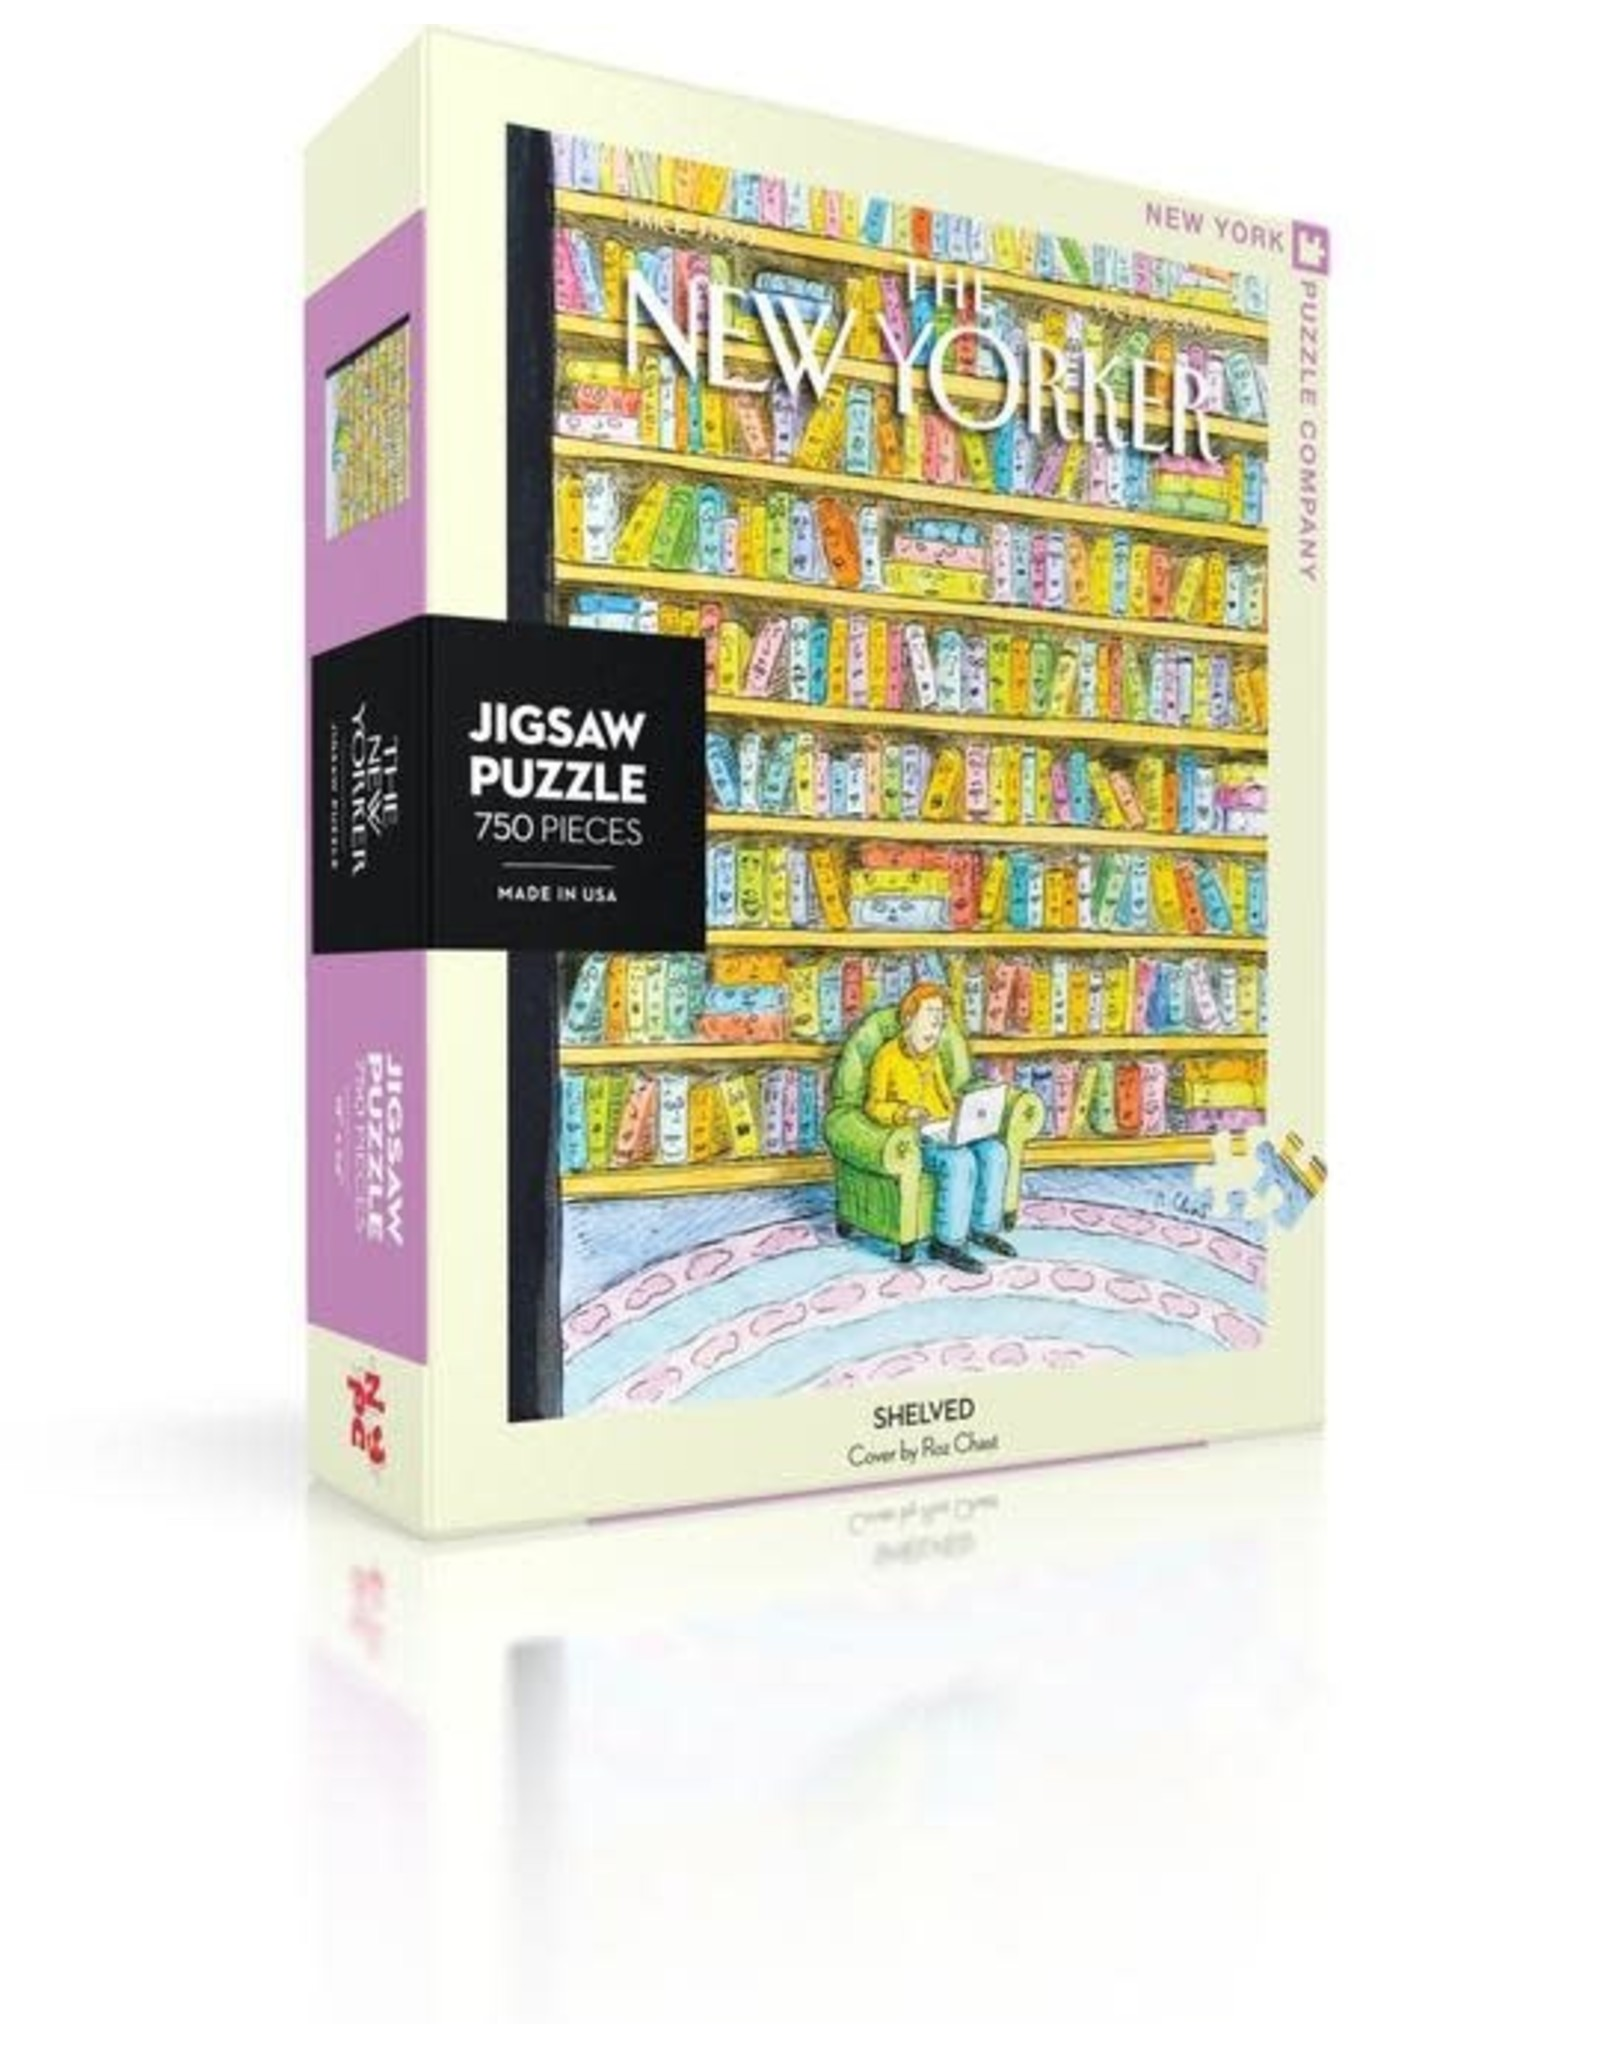 Shelved Puzzle, 750 pieces